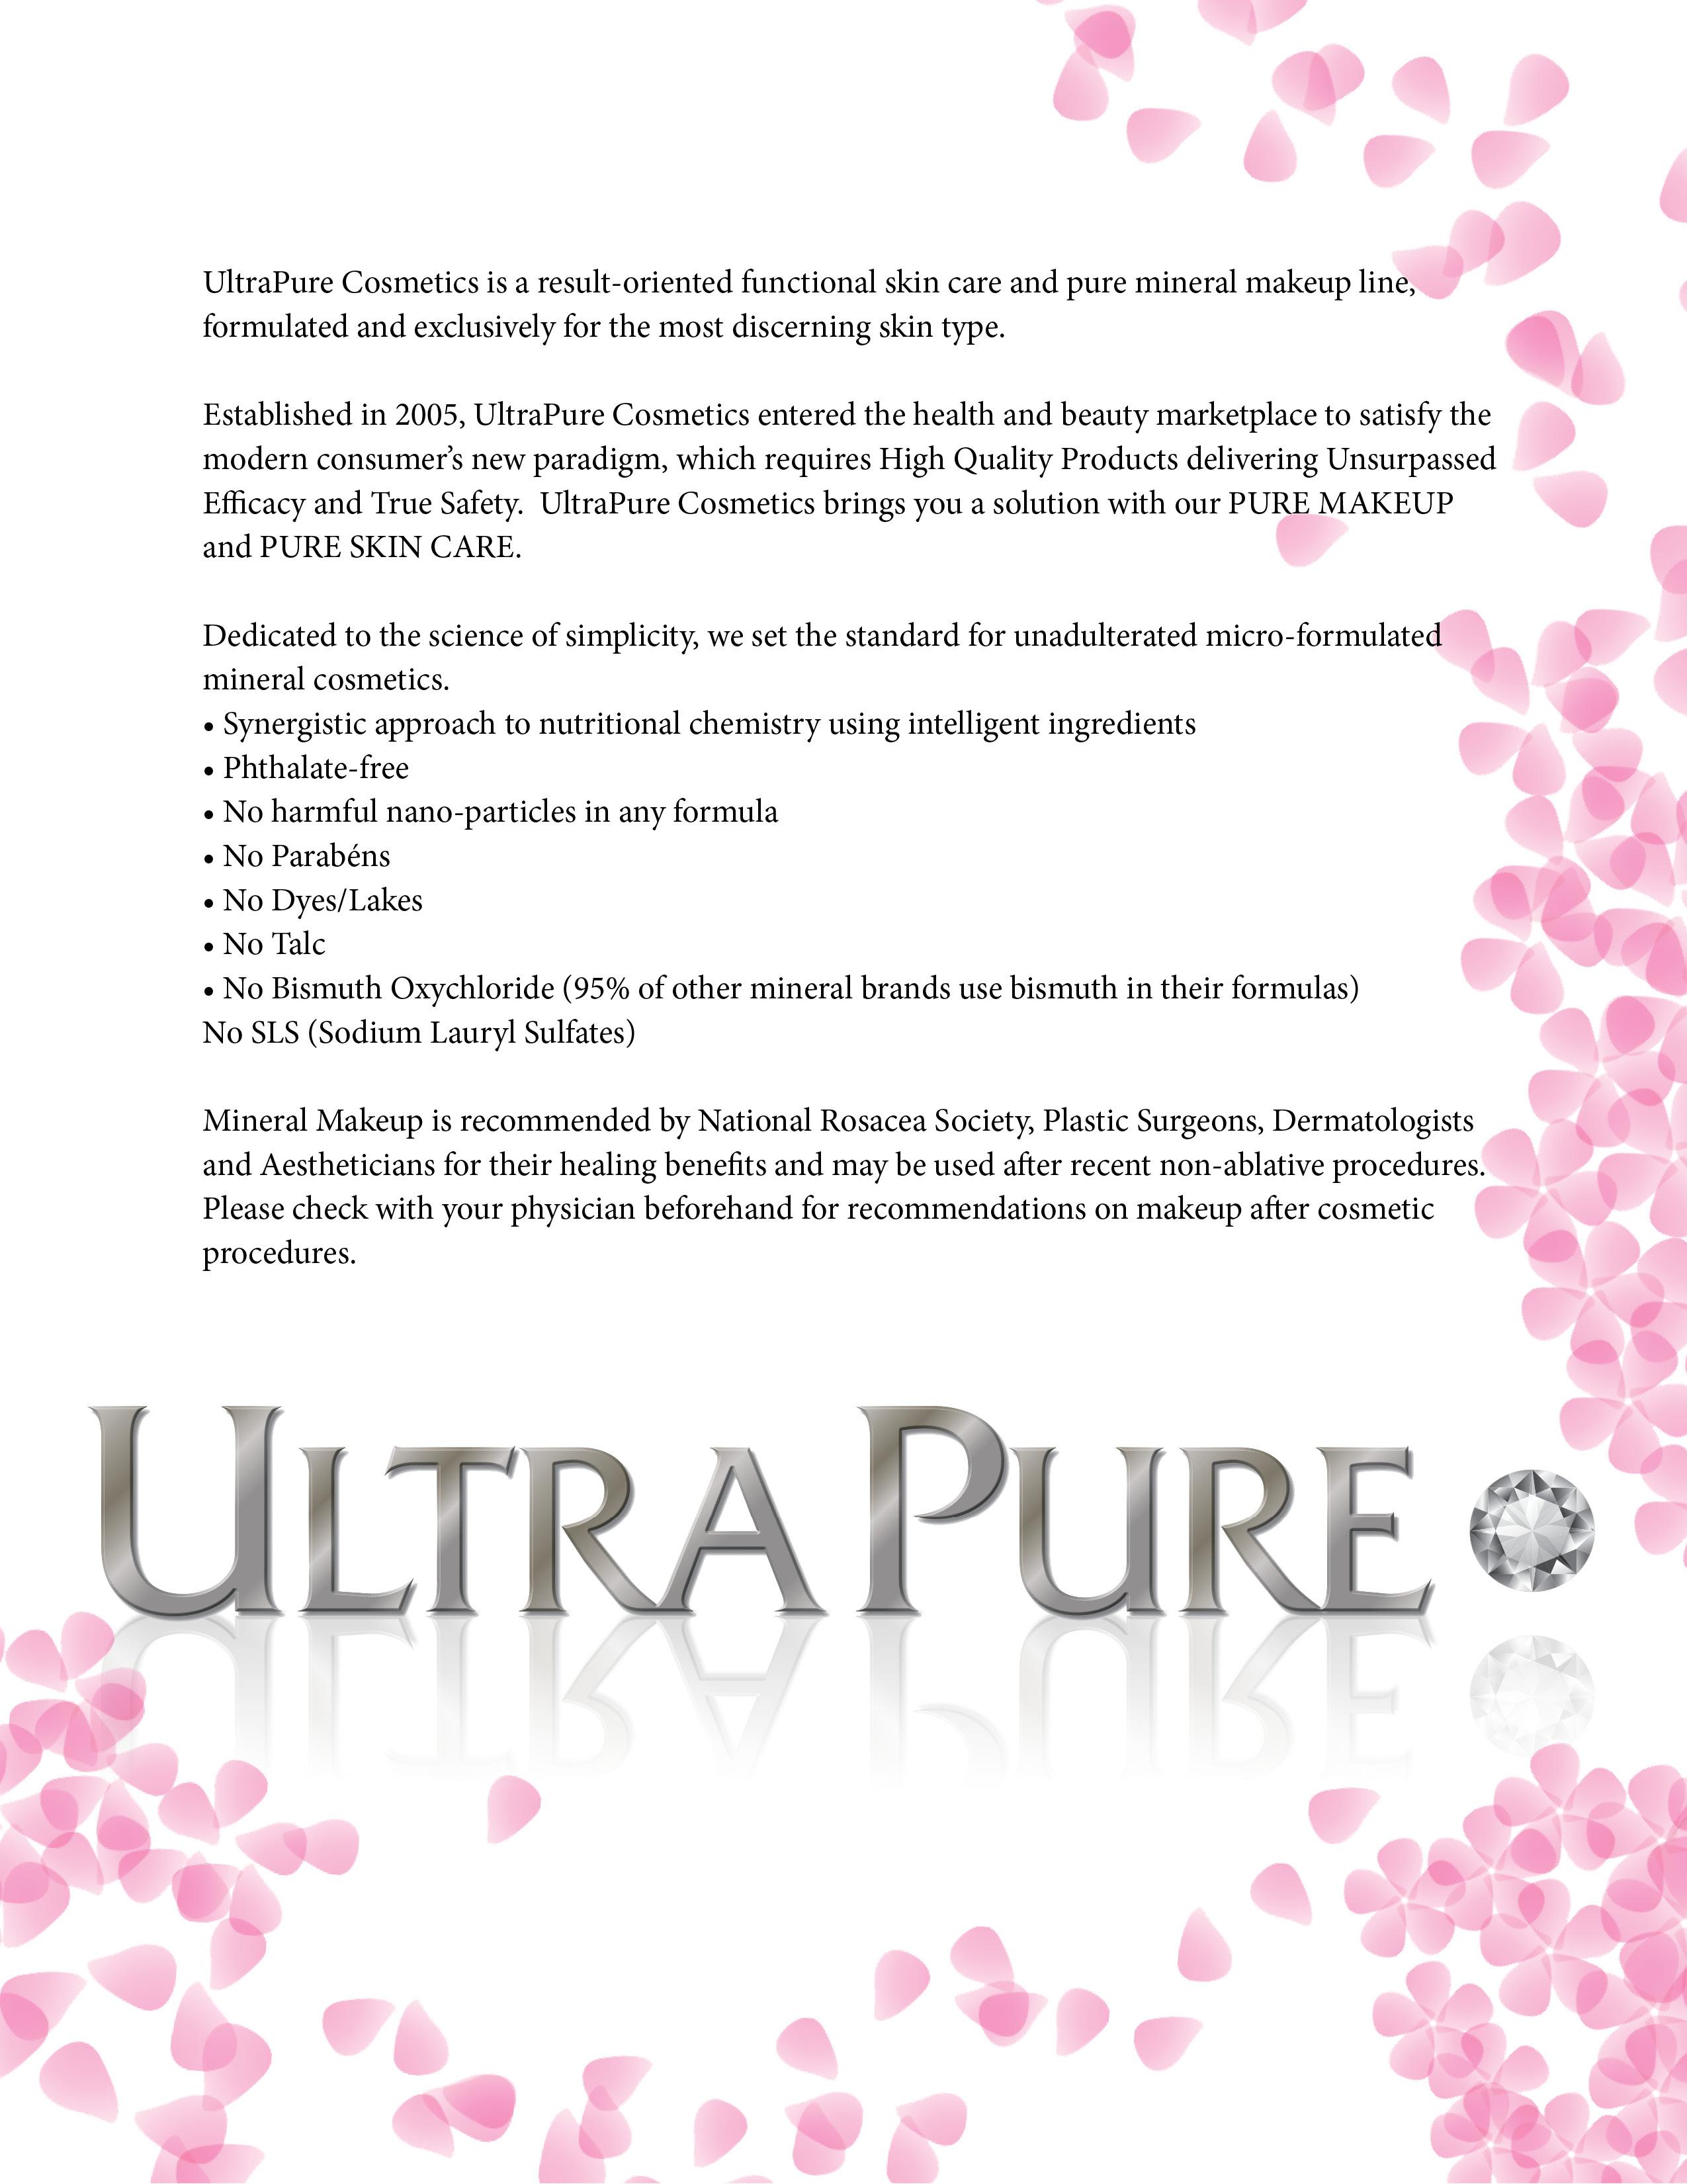 ultrapurecosmetics-catalogcompanypage.jpg